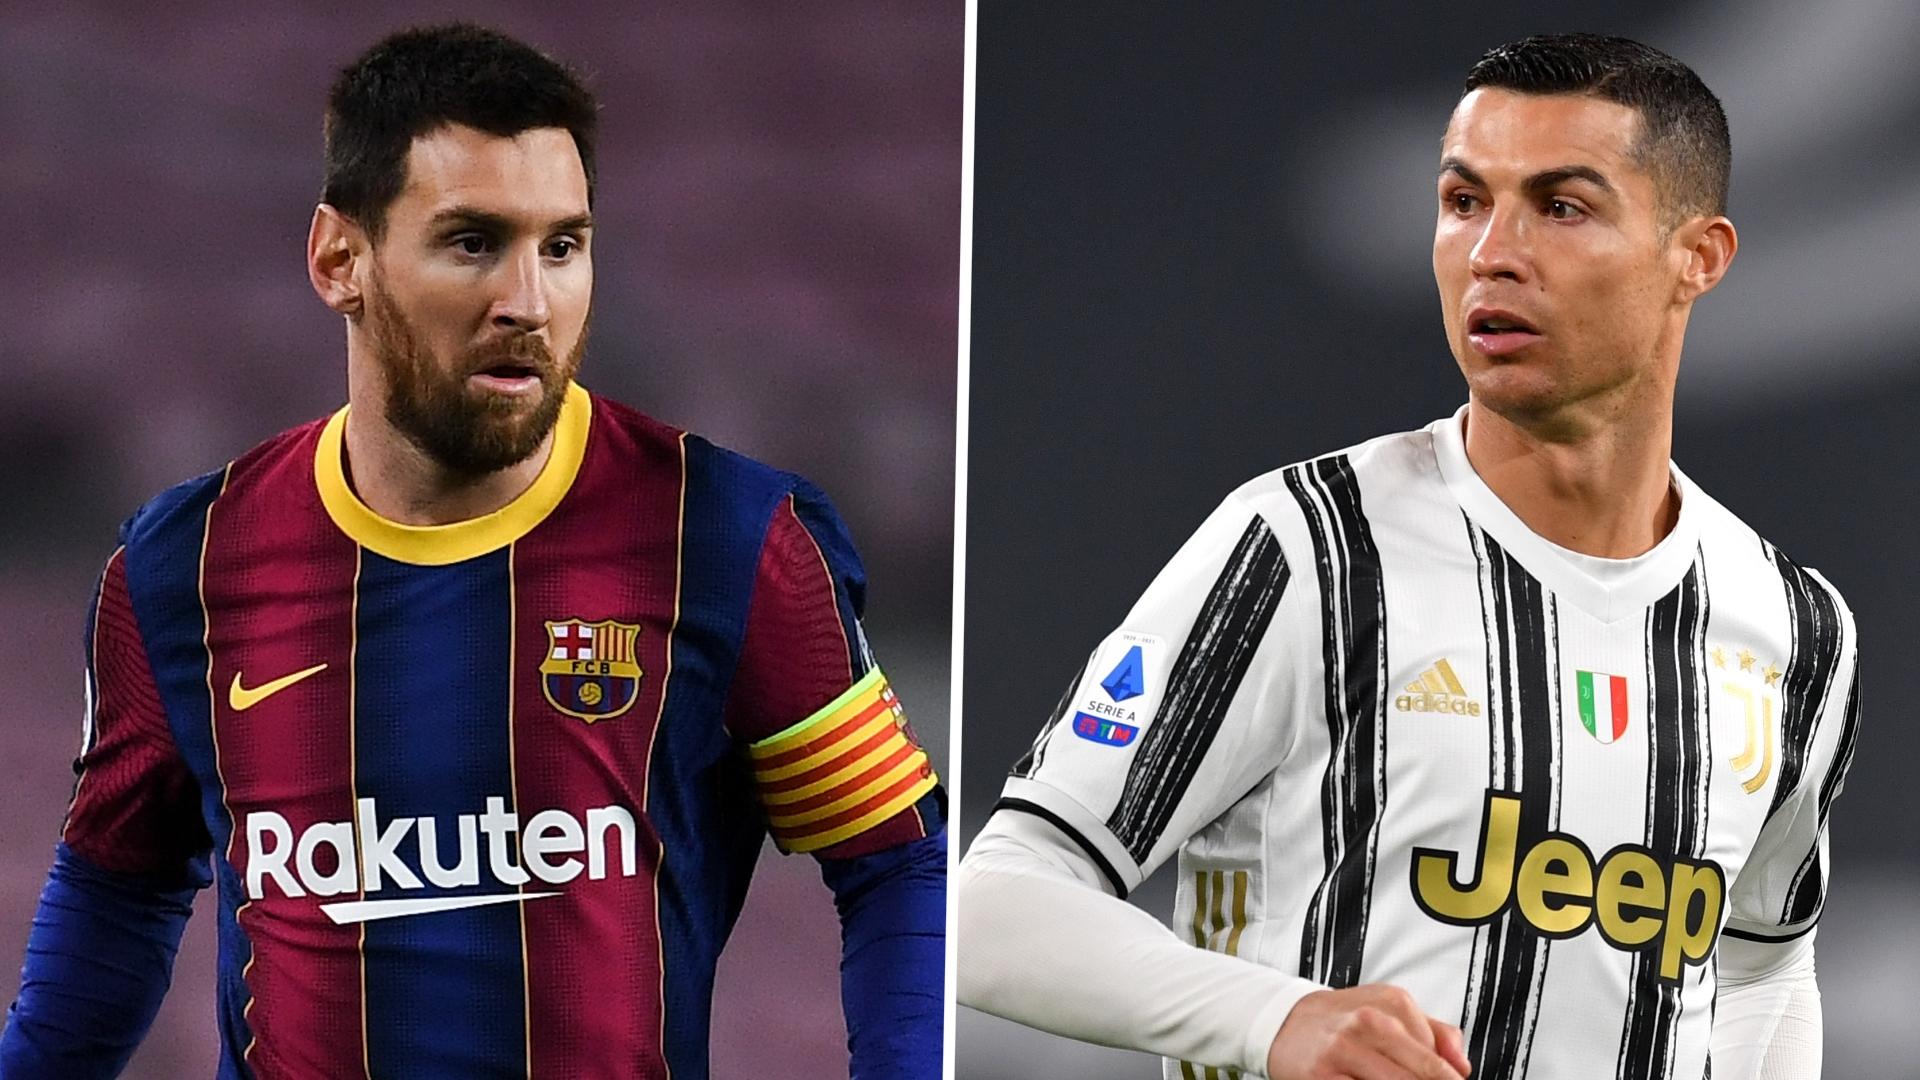 Messi-Ronaldo meeting possible as Barcelona announce Juventus pre-season exhibition